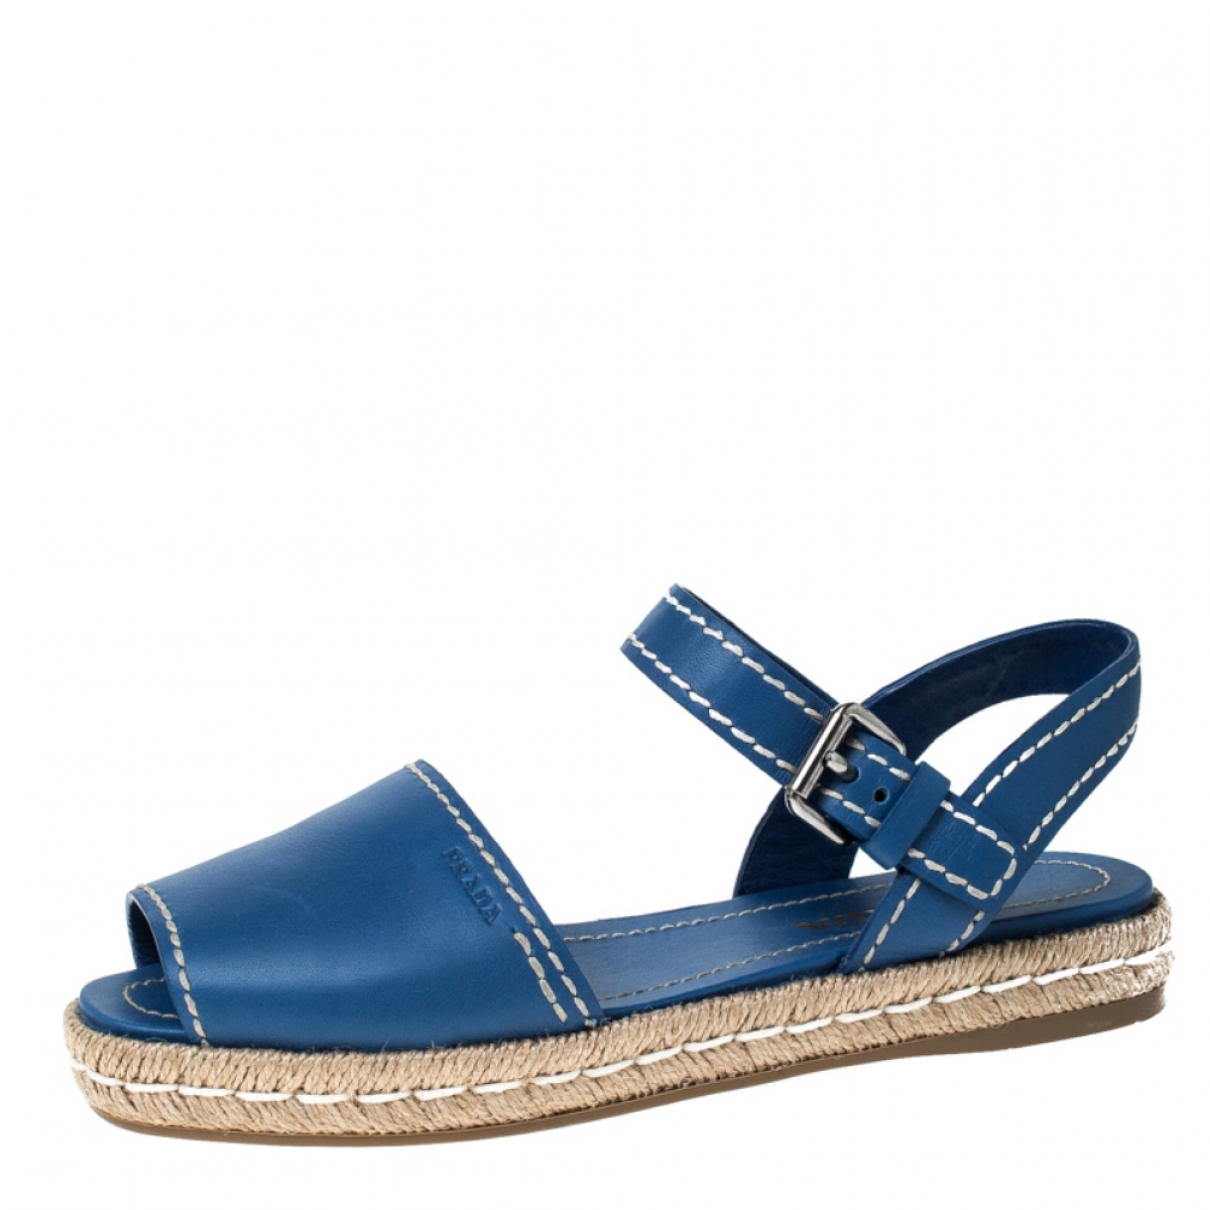 Prada \N Blue Leather Sandals for Women 8.5 US